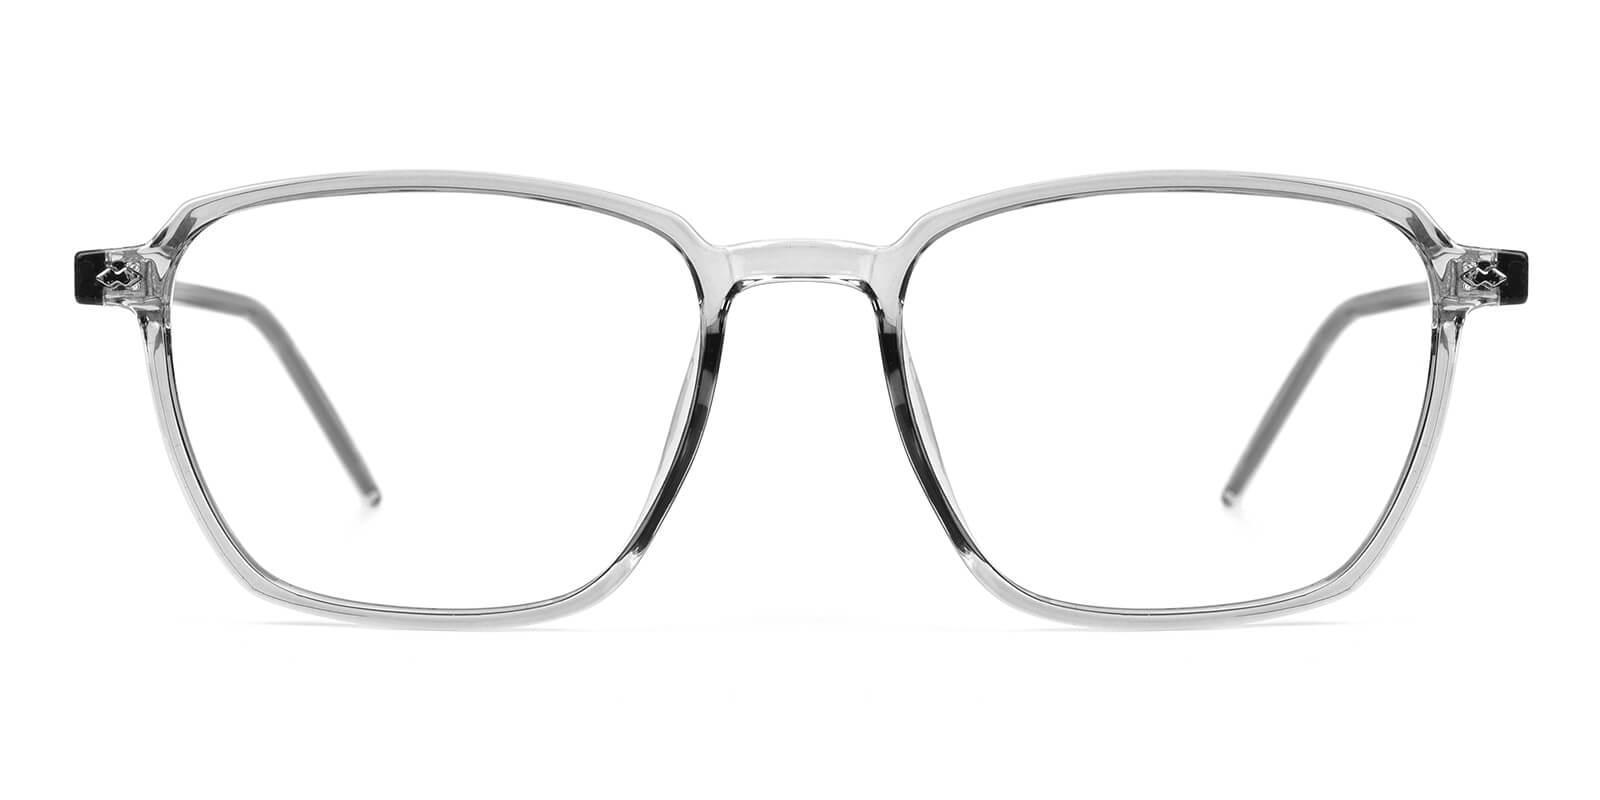 Rolita-Gray-Square-TR-Eyeglasses-additional2